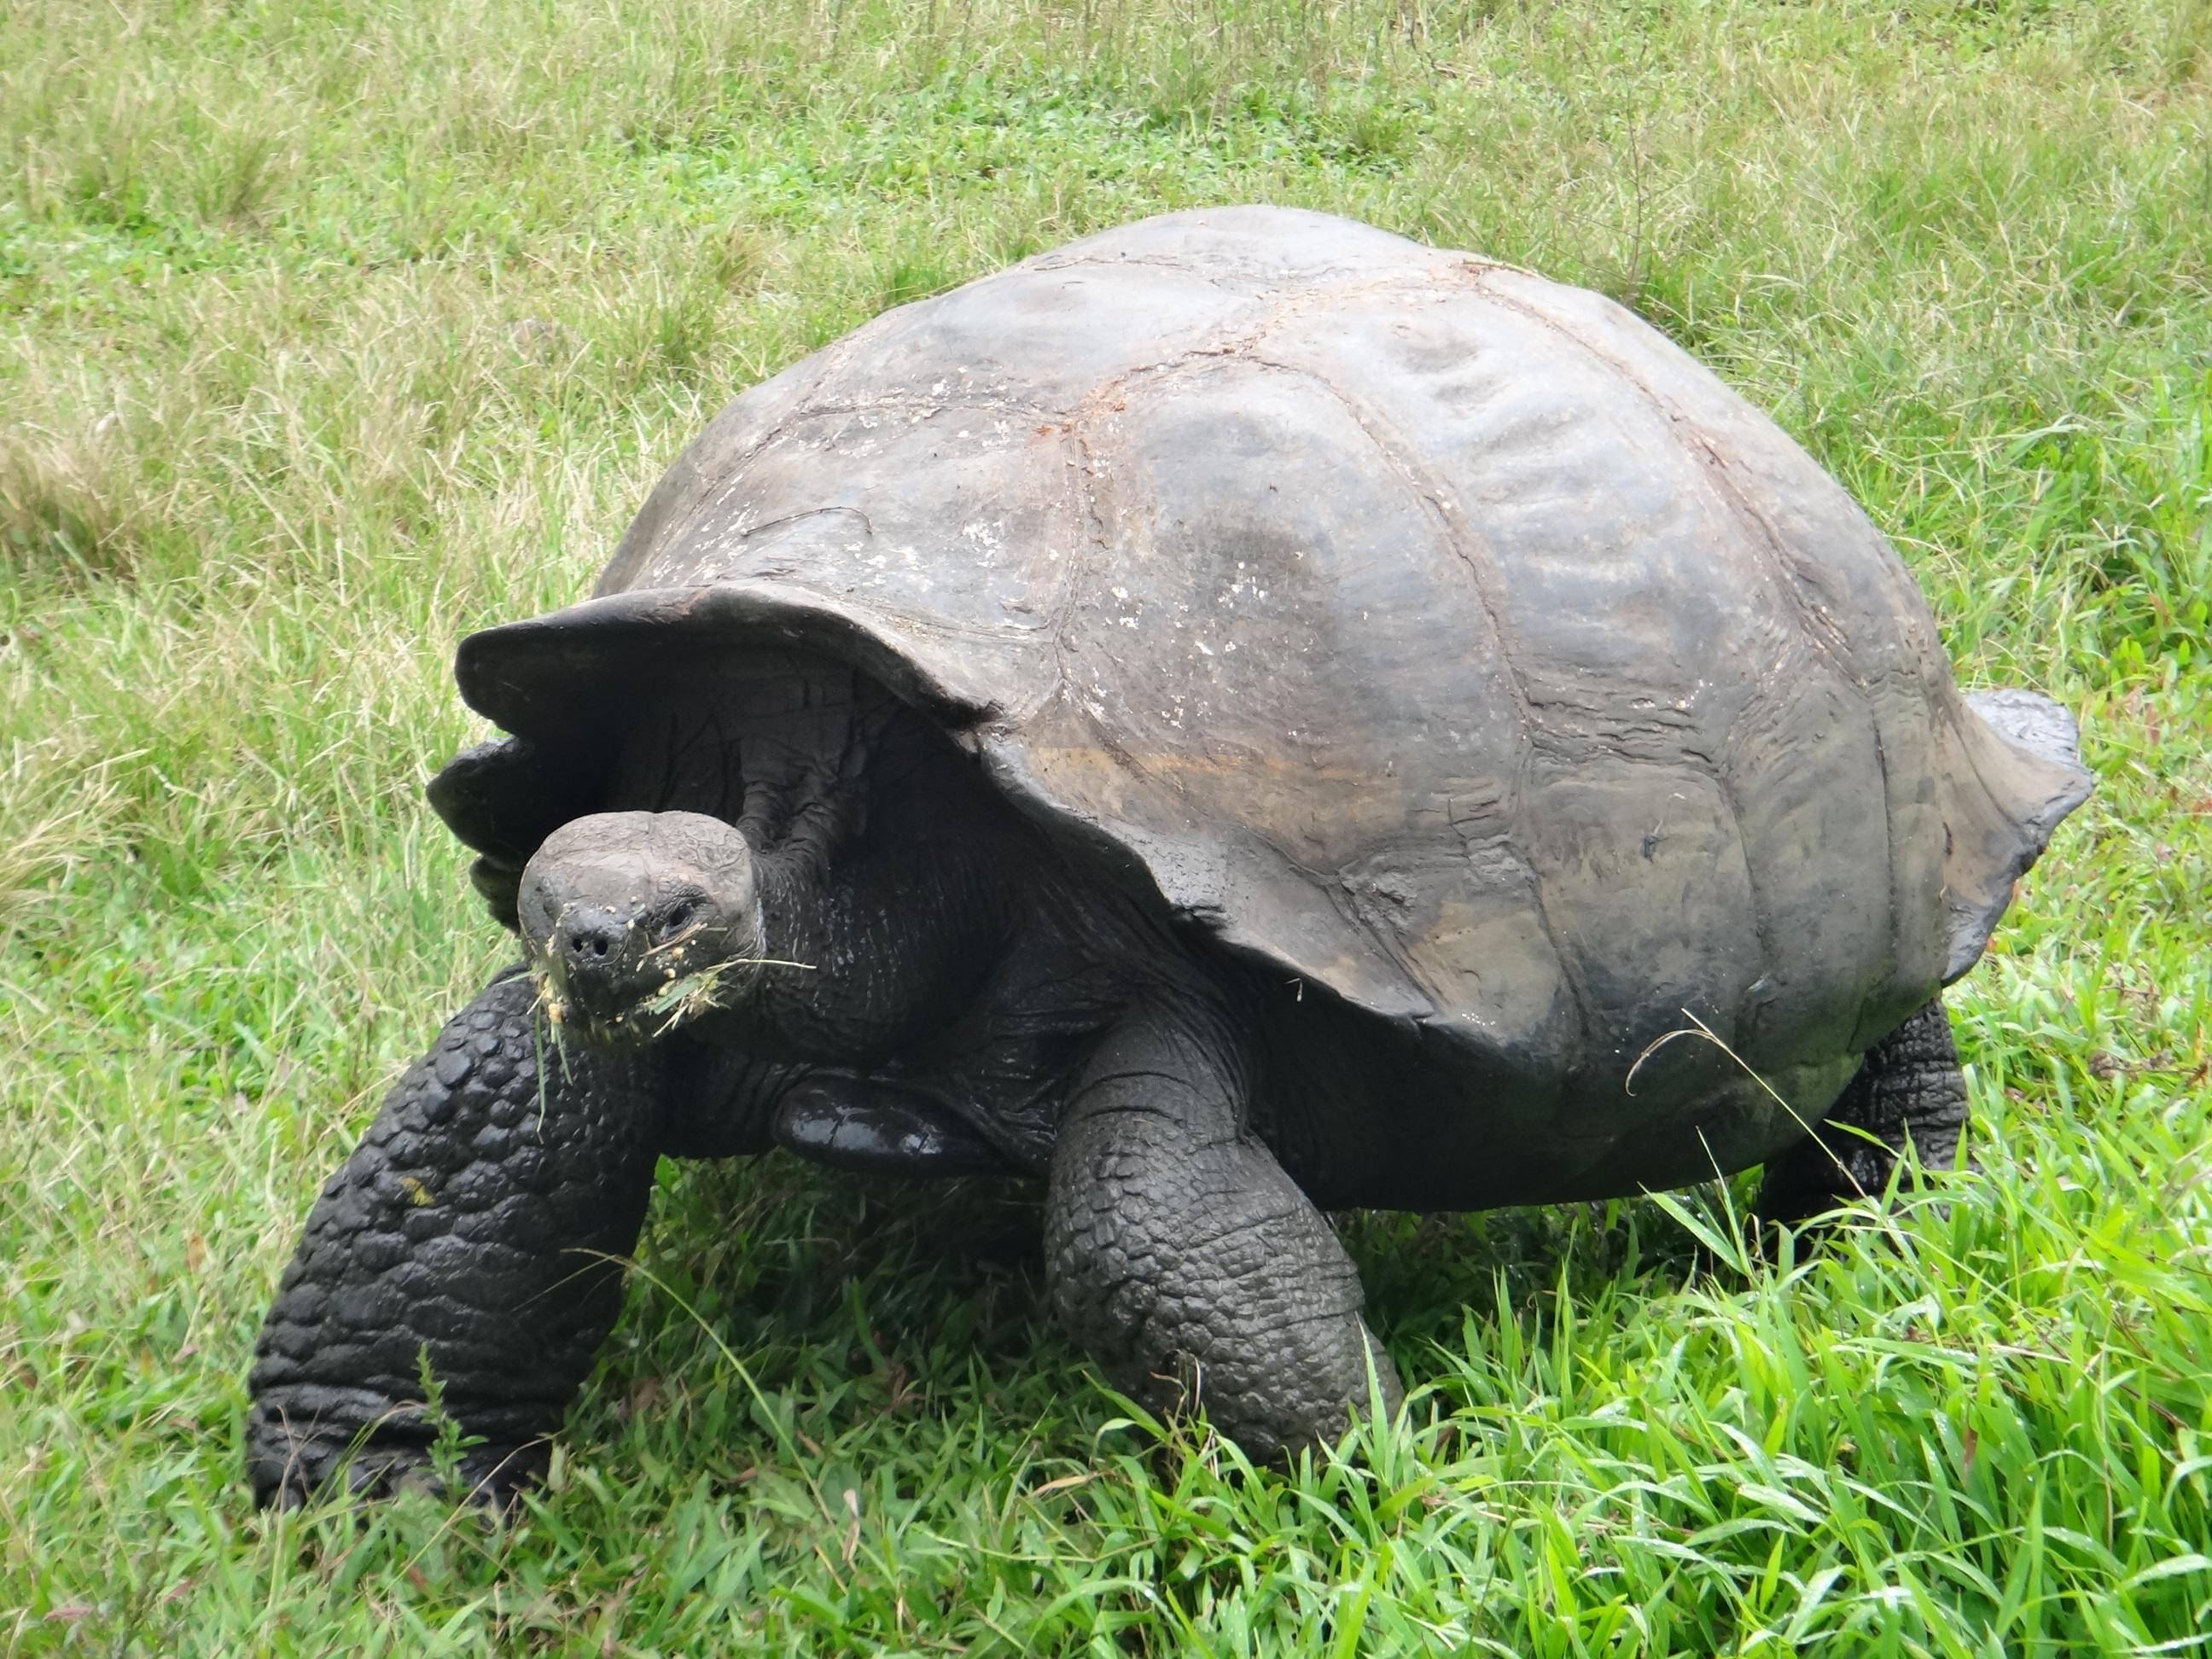 Ecuador_Galapagos Islands_Isla Santa Cruz_Rancho Primicias Wildlife Reserve in Santa Rosa_Giant Land Tortoise